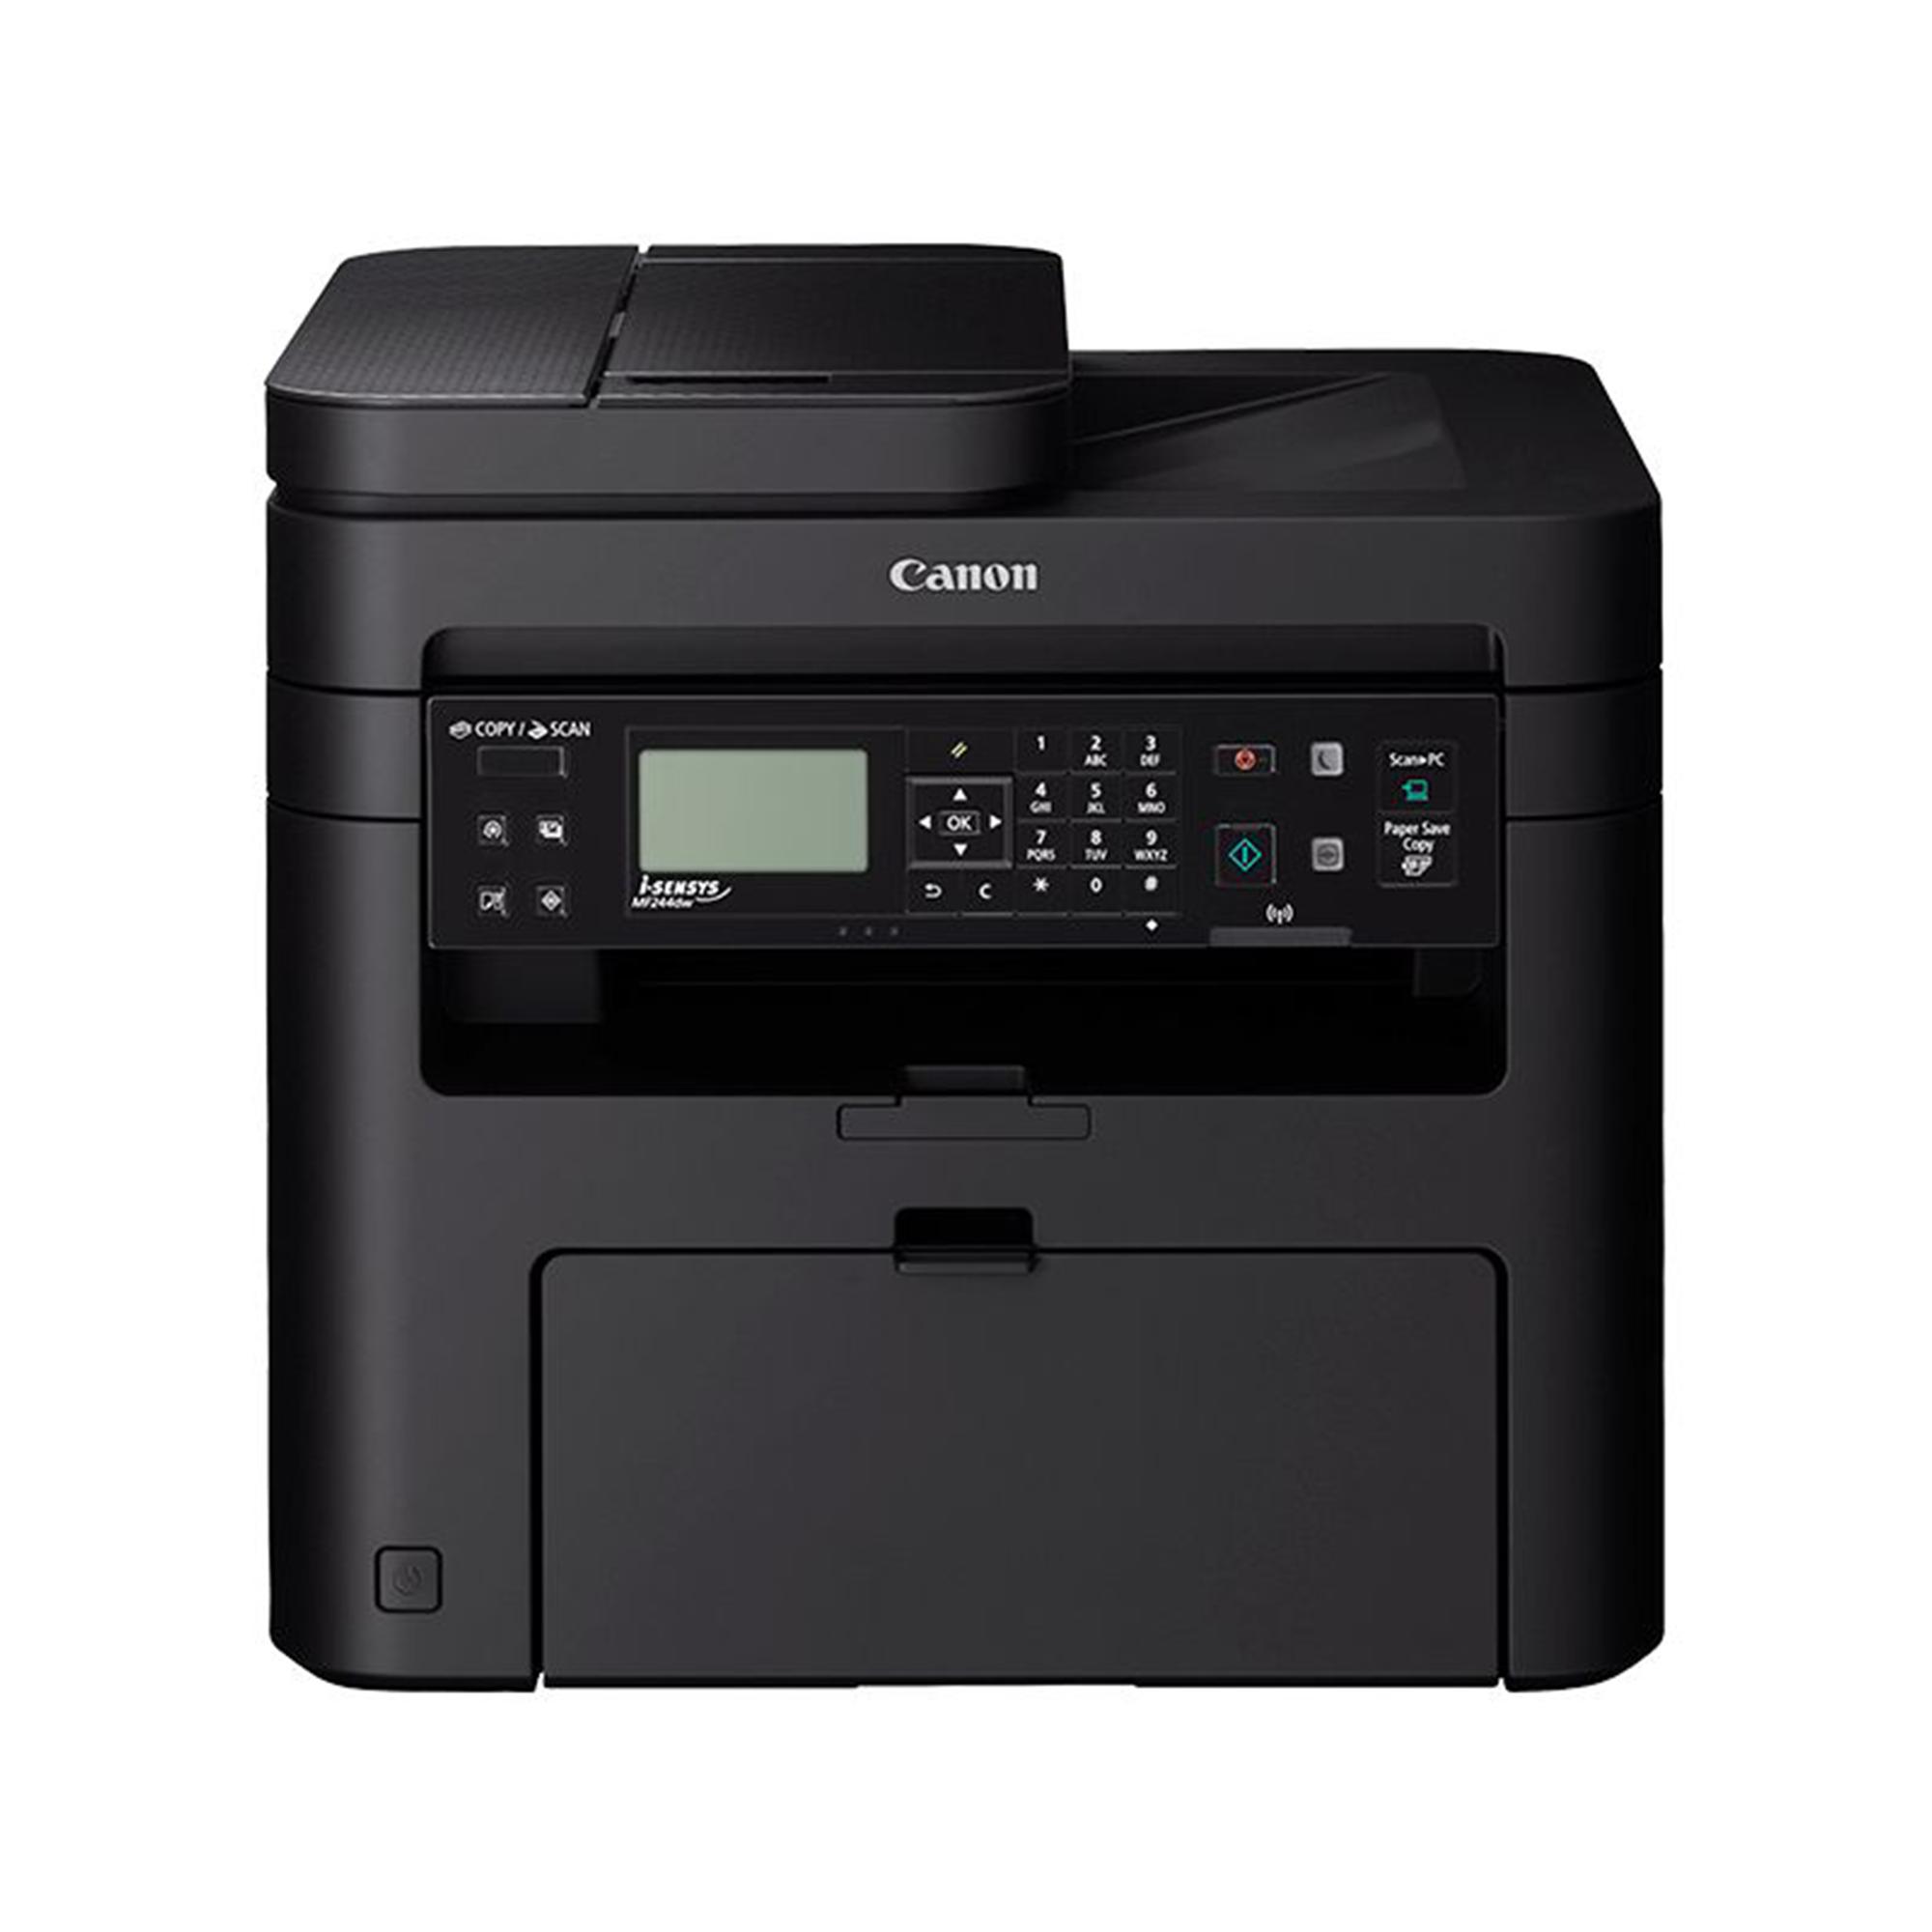 Canon i-SENSYS MF237w Laser Printer